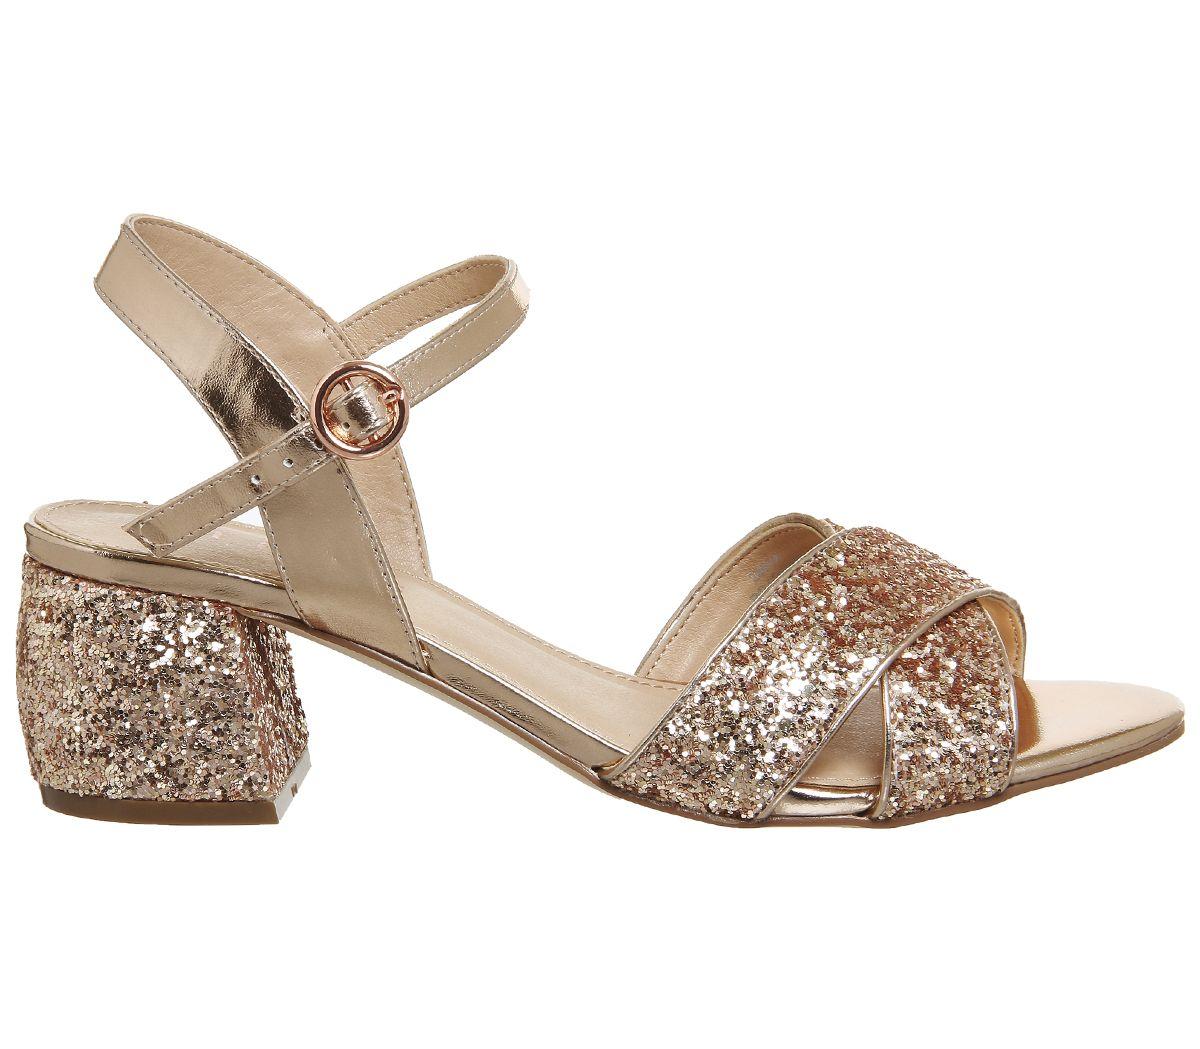 c1c5fce4c1c Office Merlot Block Heel Sandals Rose Gold Glitter - Mid Heels